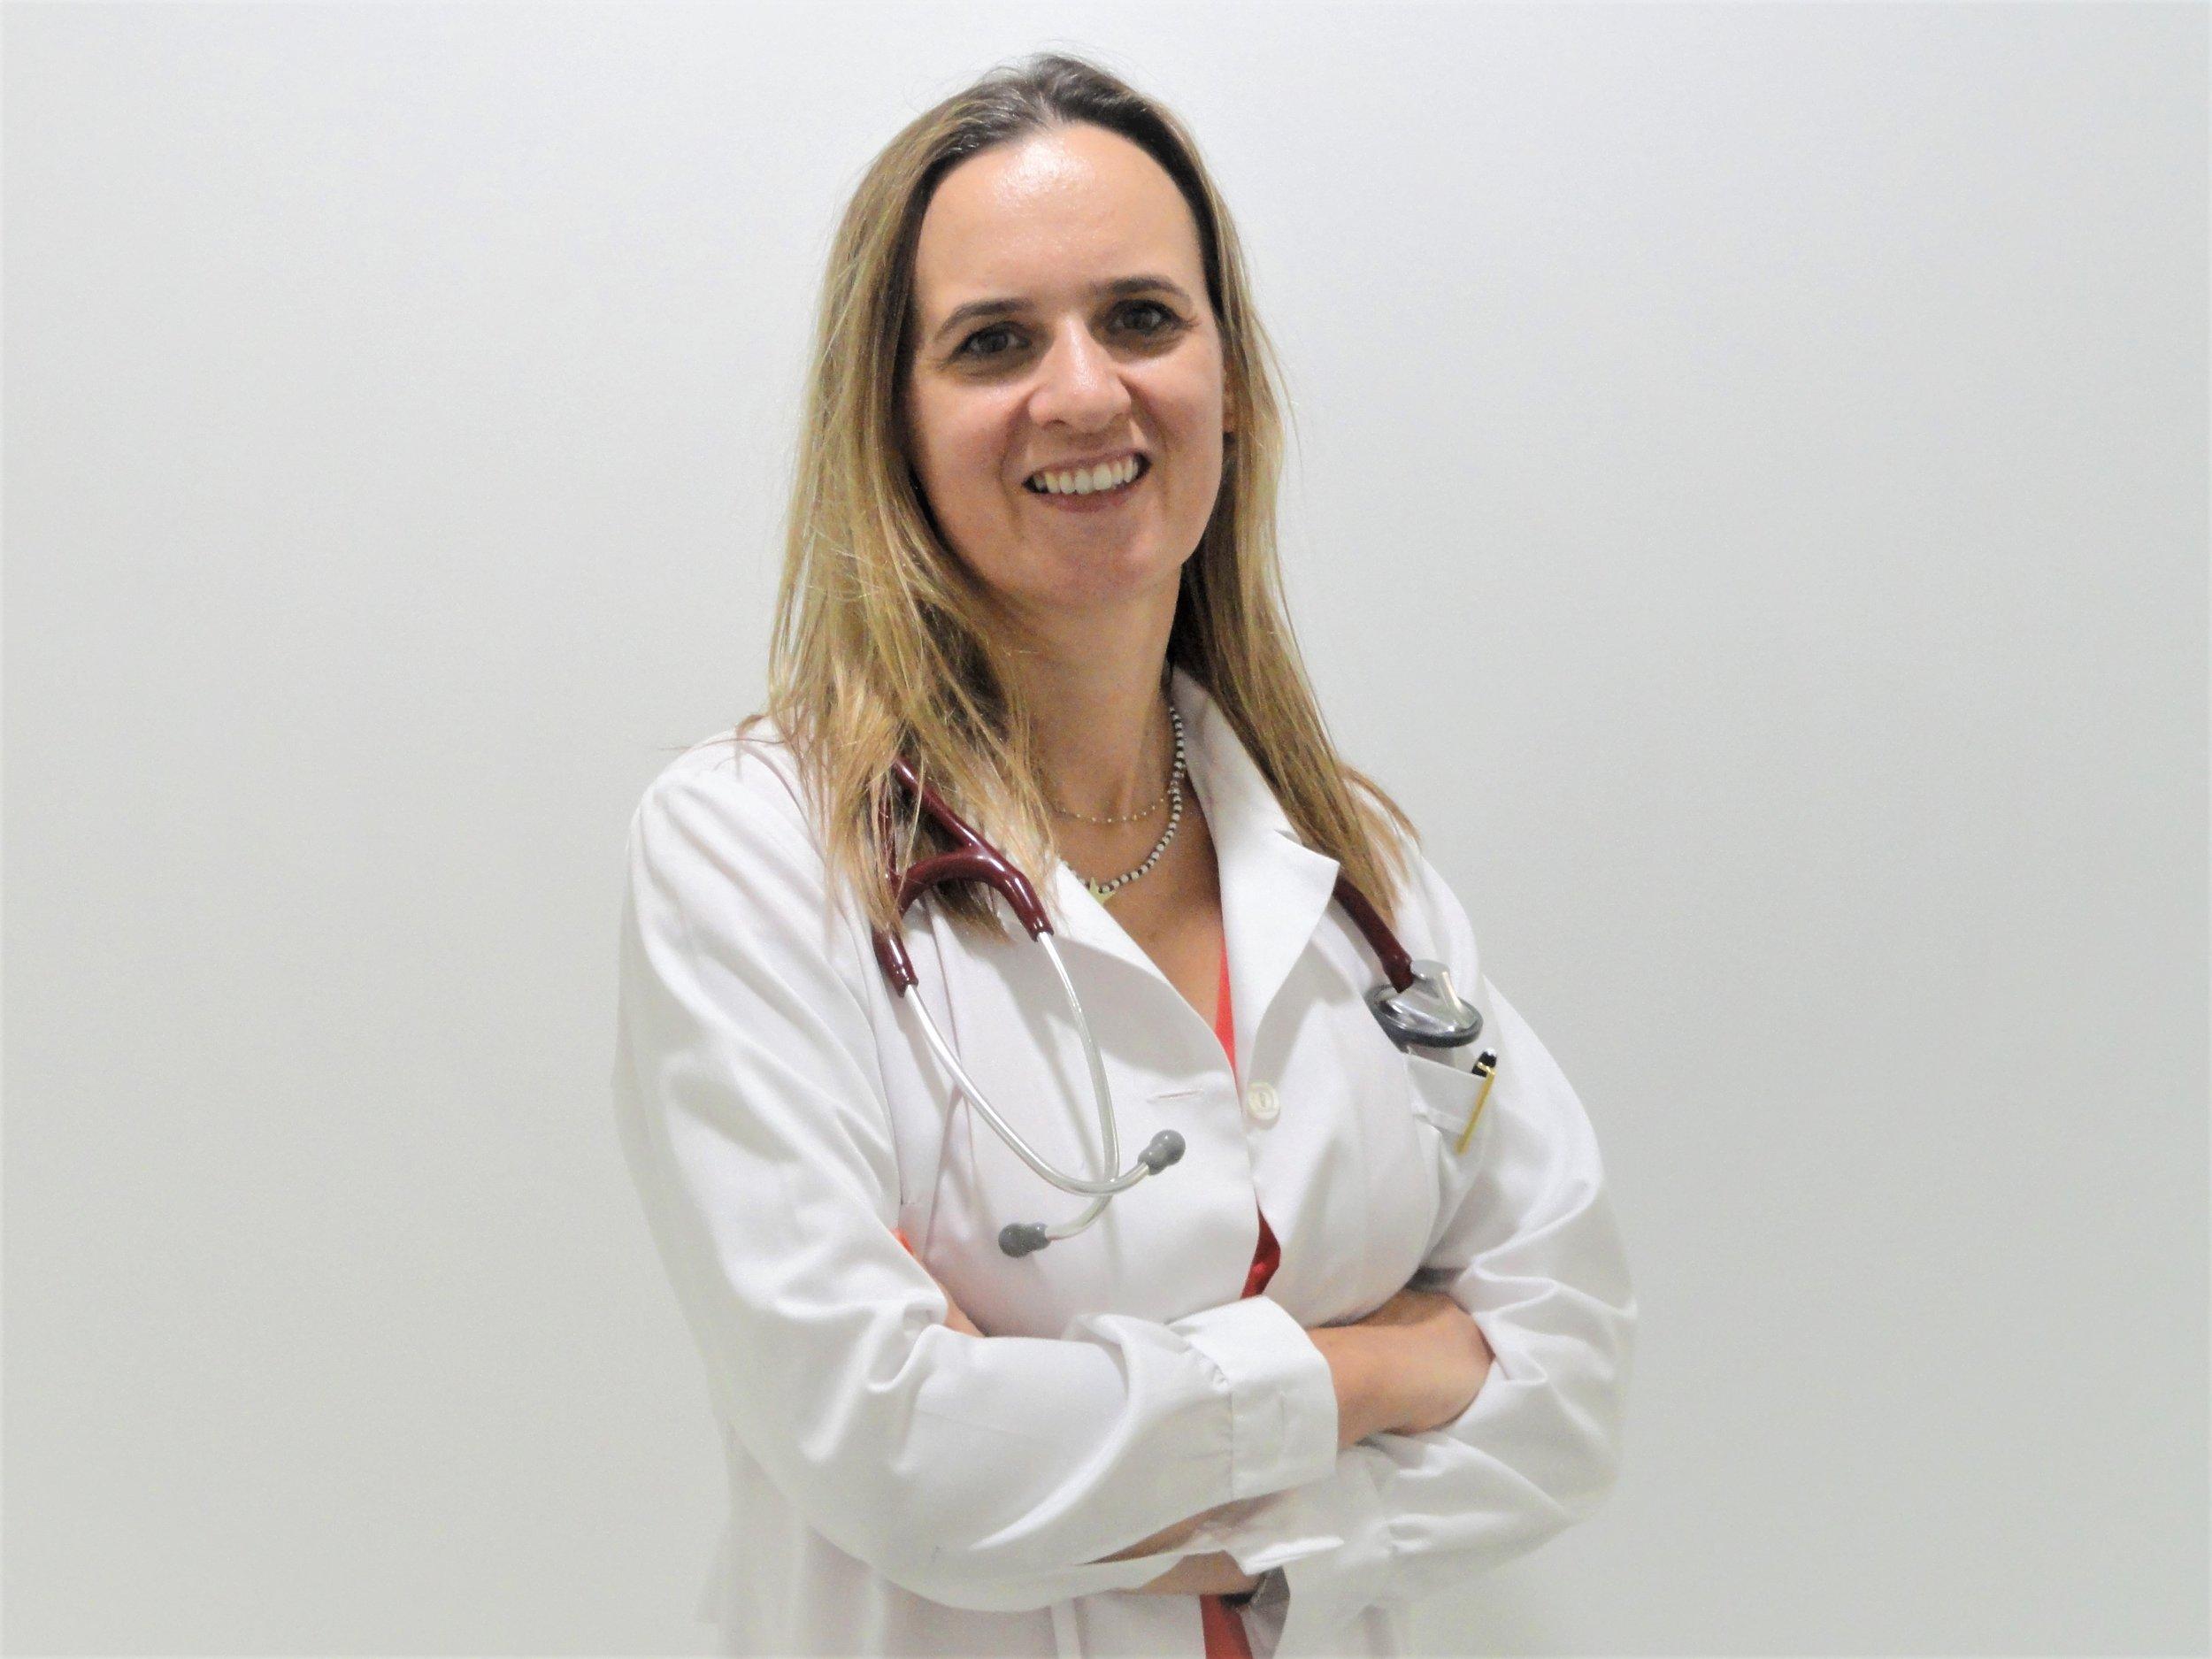 Dra. Susana Castela copia- Cardiologia (3).jpg